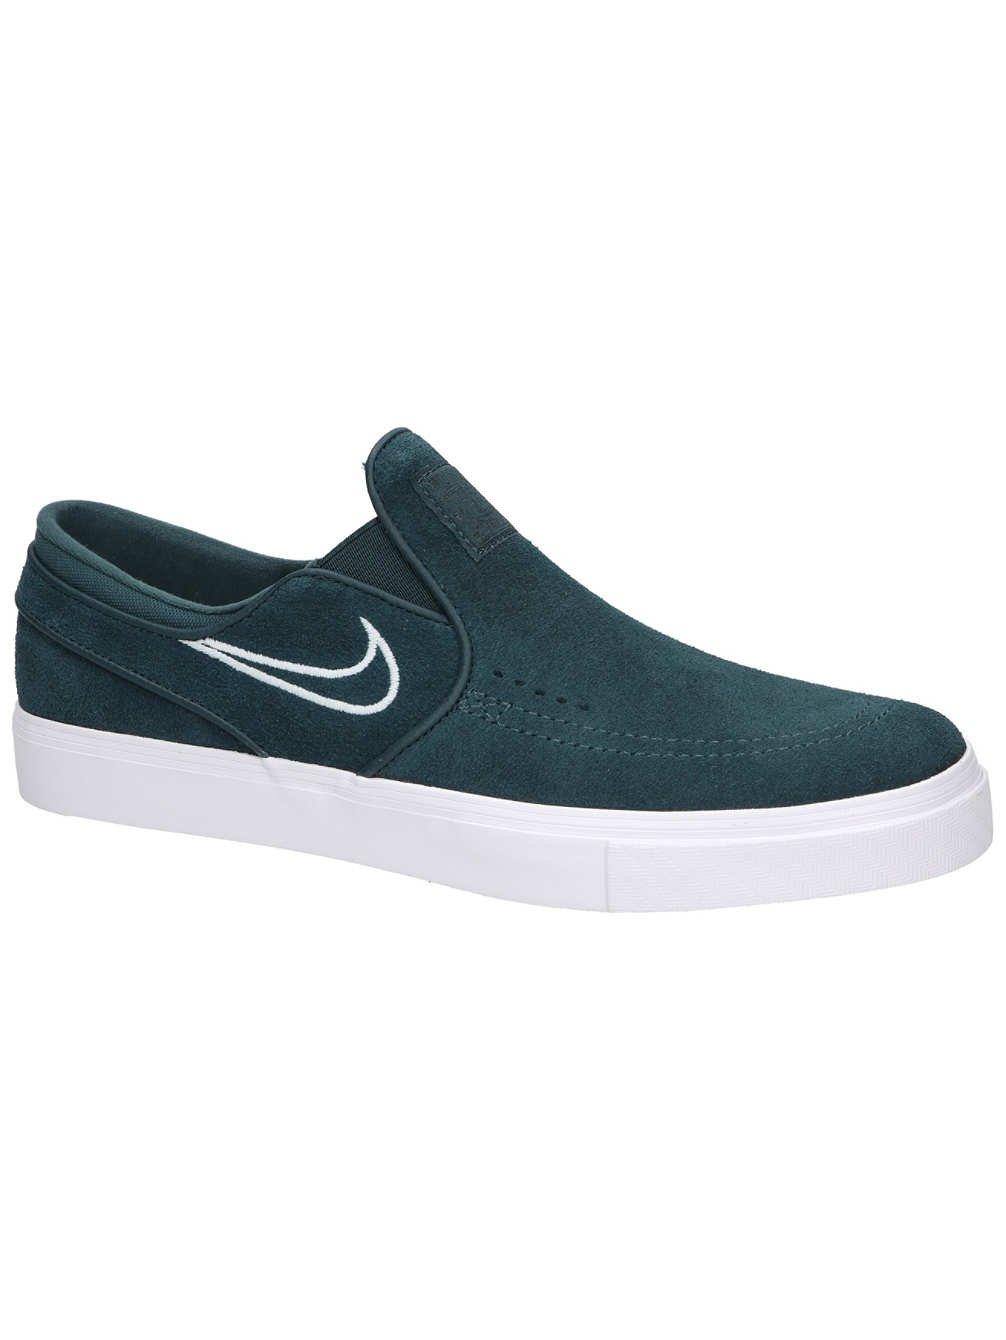 brand new 366af 0d265 Nike, Scarpe da Skateboard Uomo, (Deep Jungle Barley Barley Barley grigio  W), 9.5 B07DPW8M97 Parent   Vogue   Nuove Varietà Vengono Introdotti Uno  Dopo ...